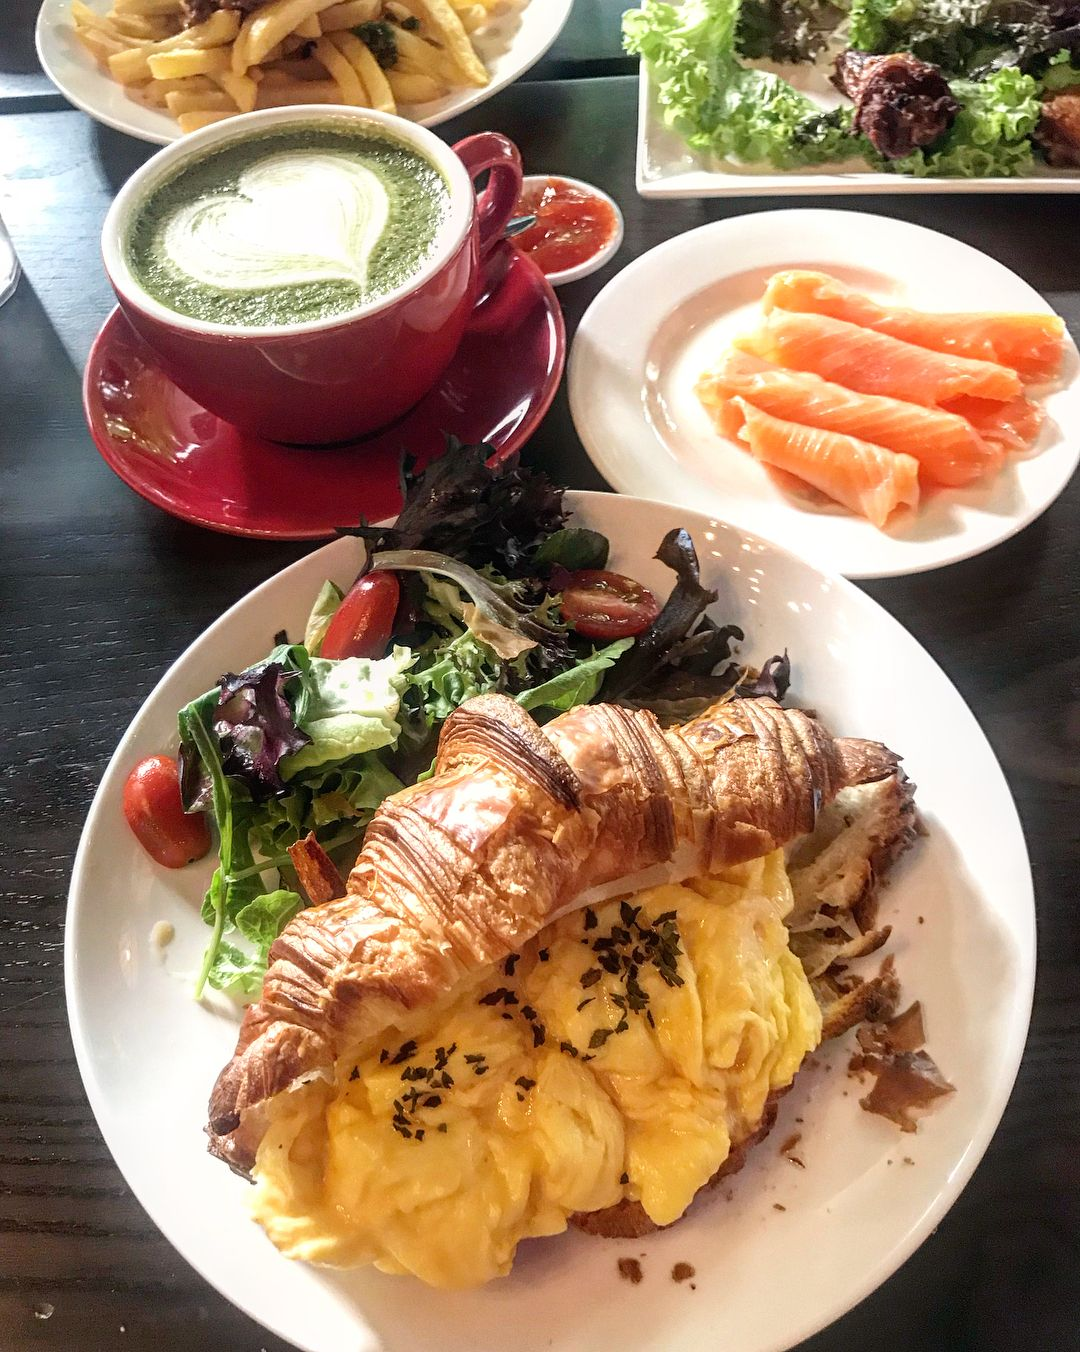 Macpherson food  - Knots Cafe